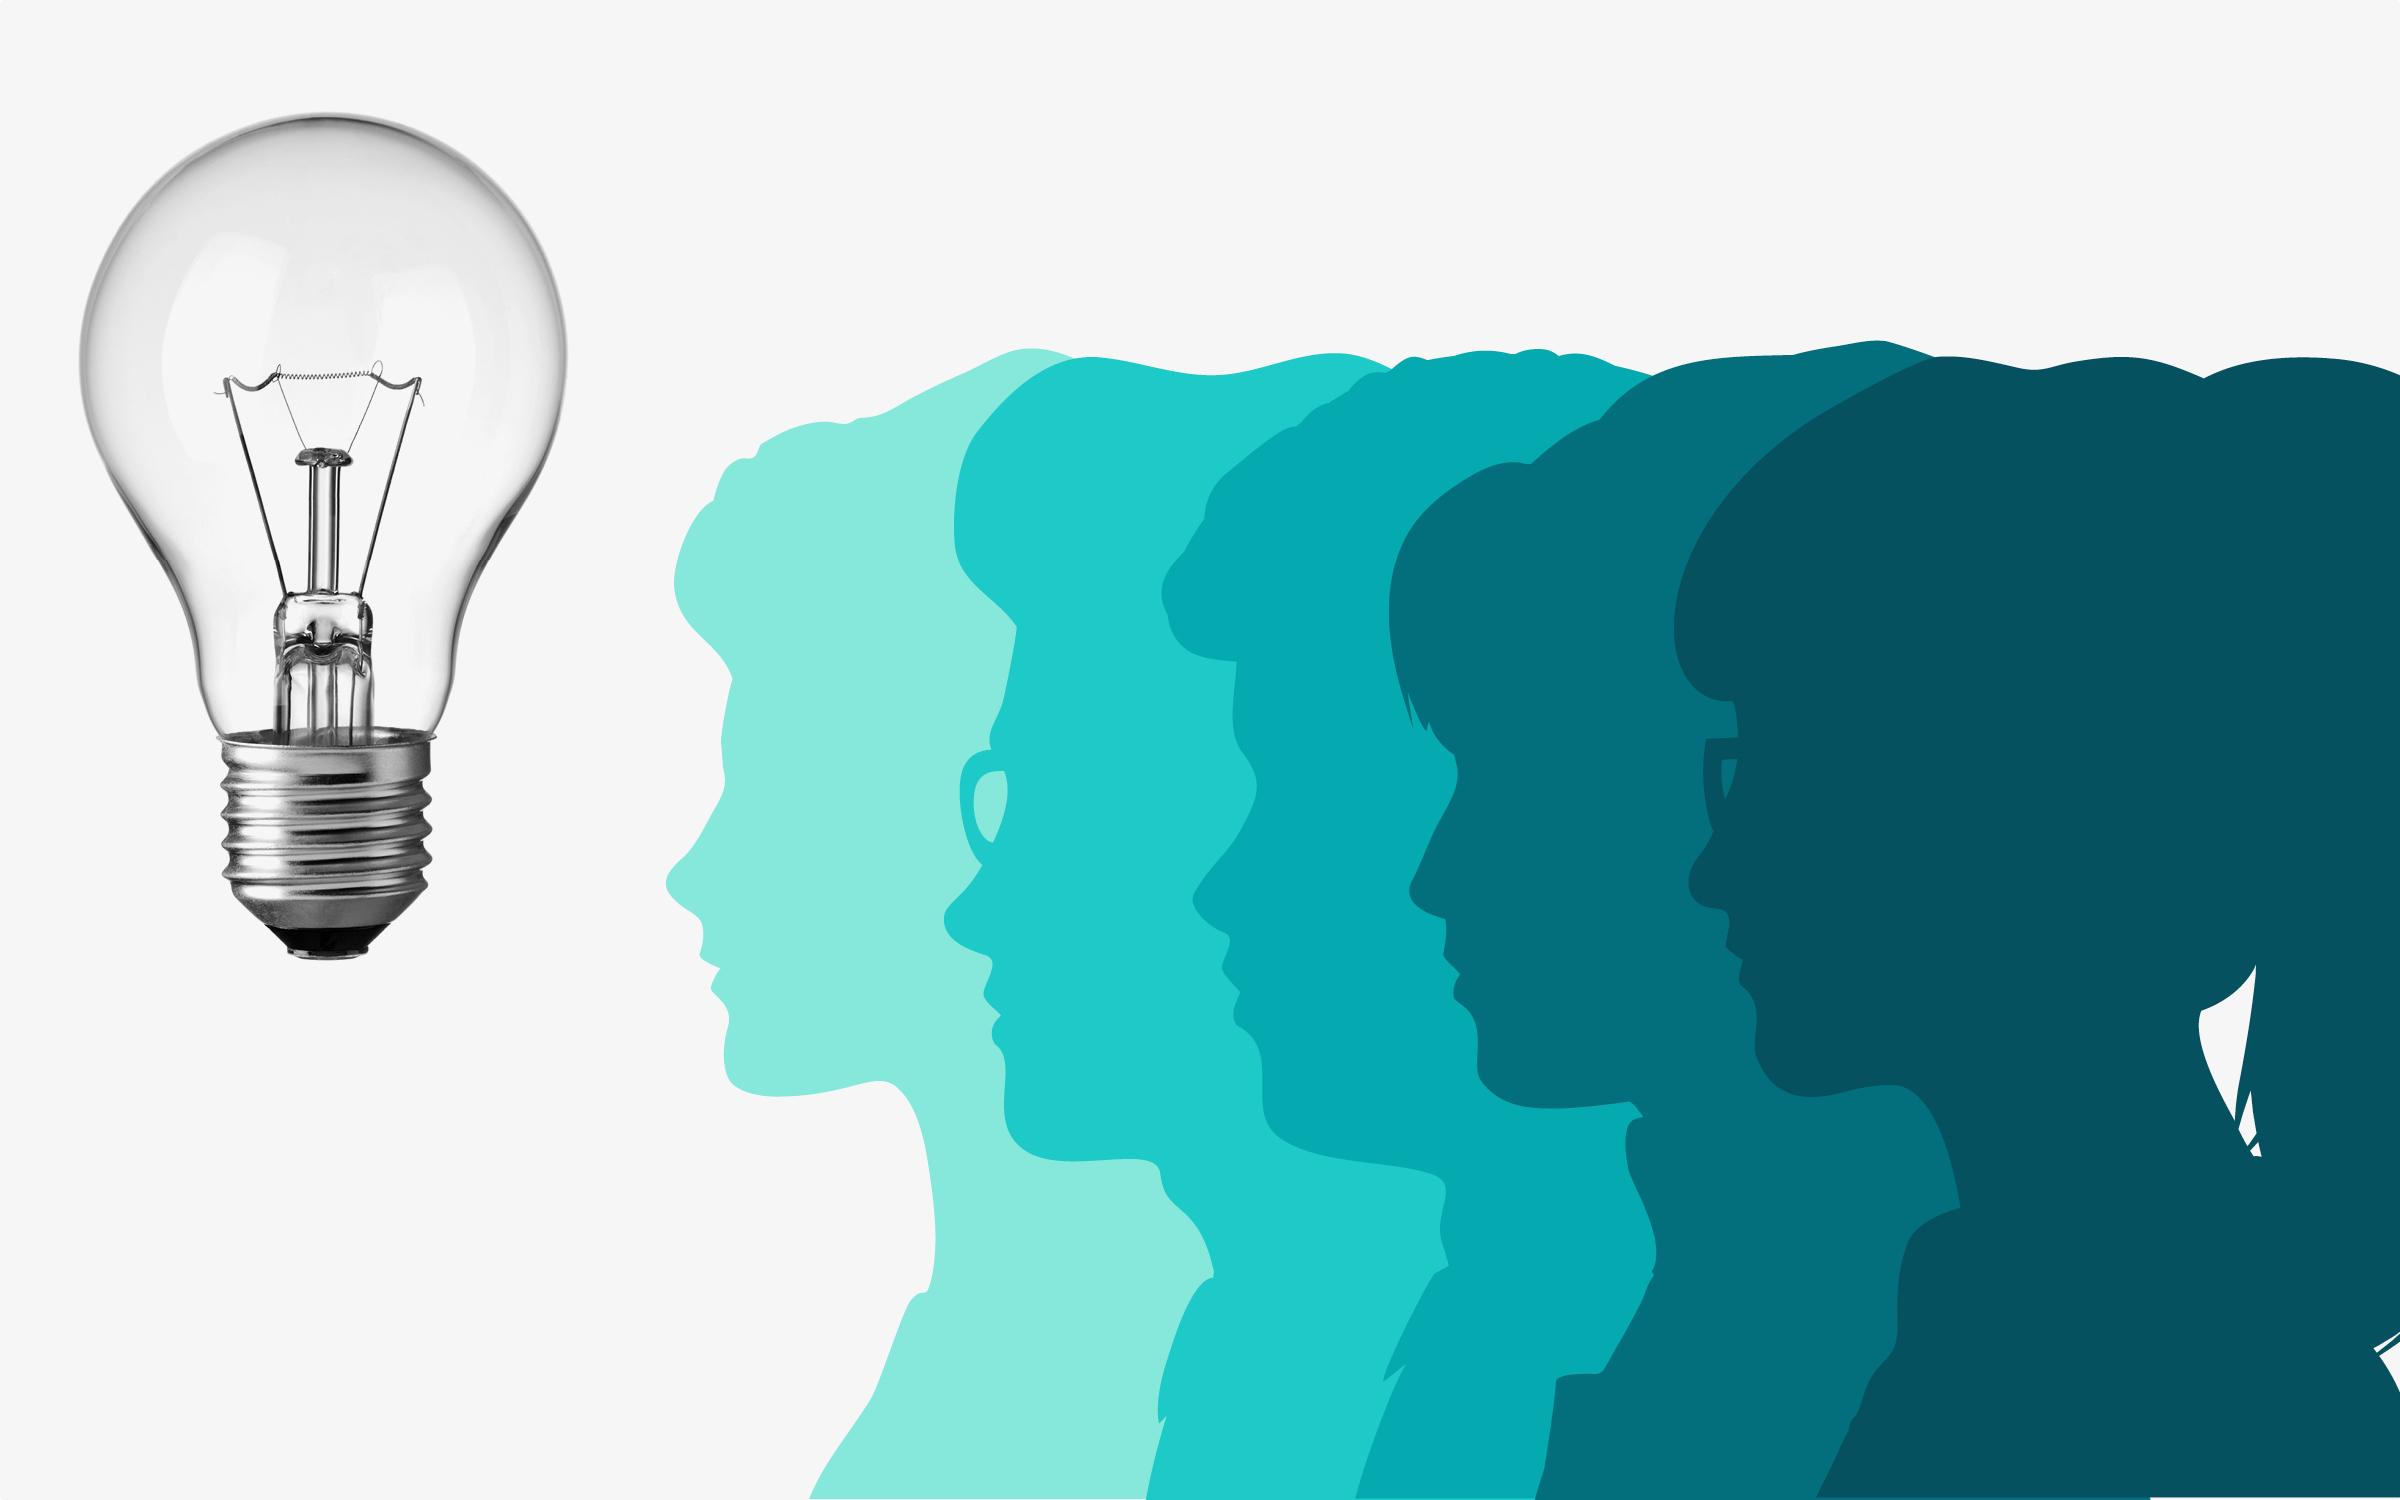 Diverse Voices in Design: Leveraging Your Superpower